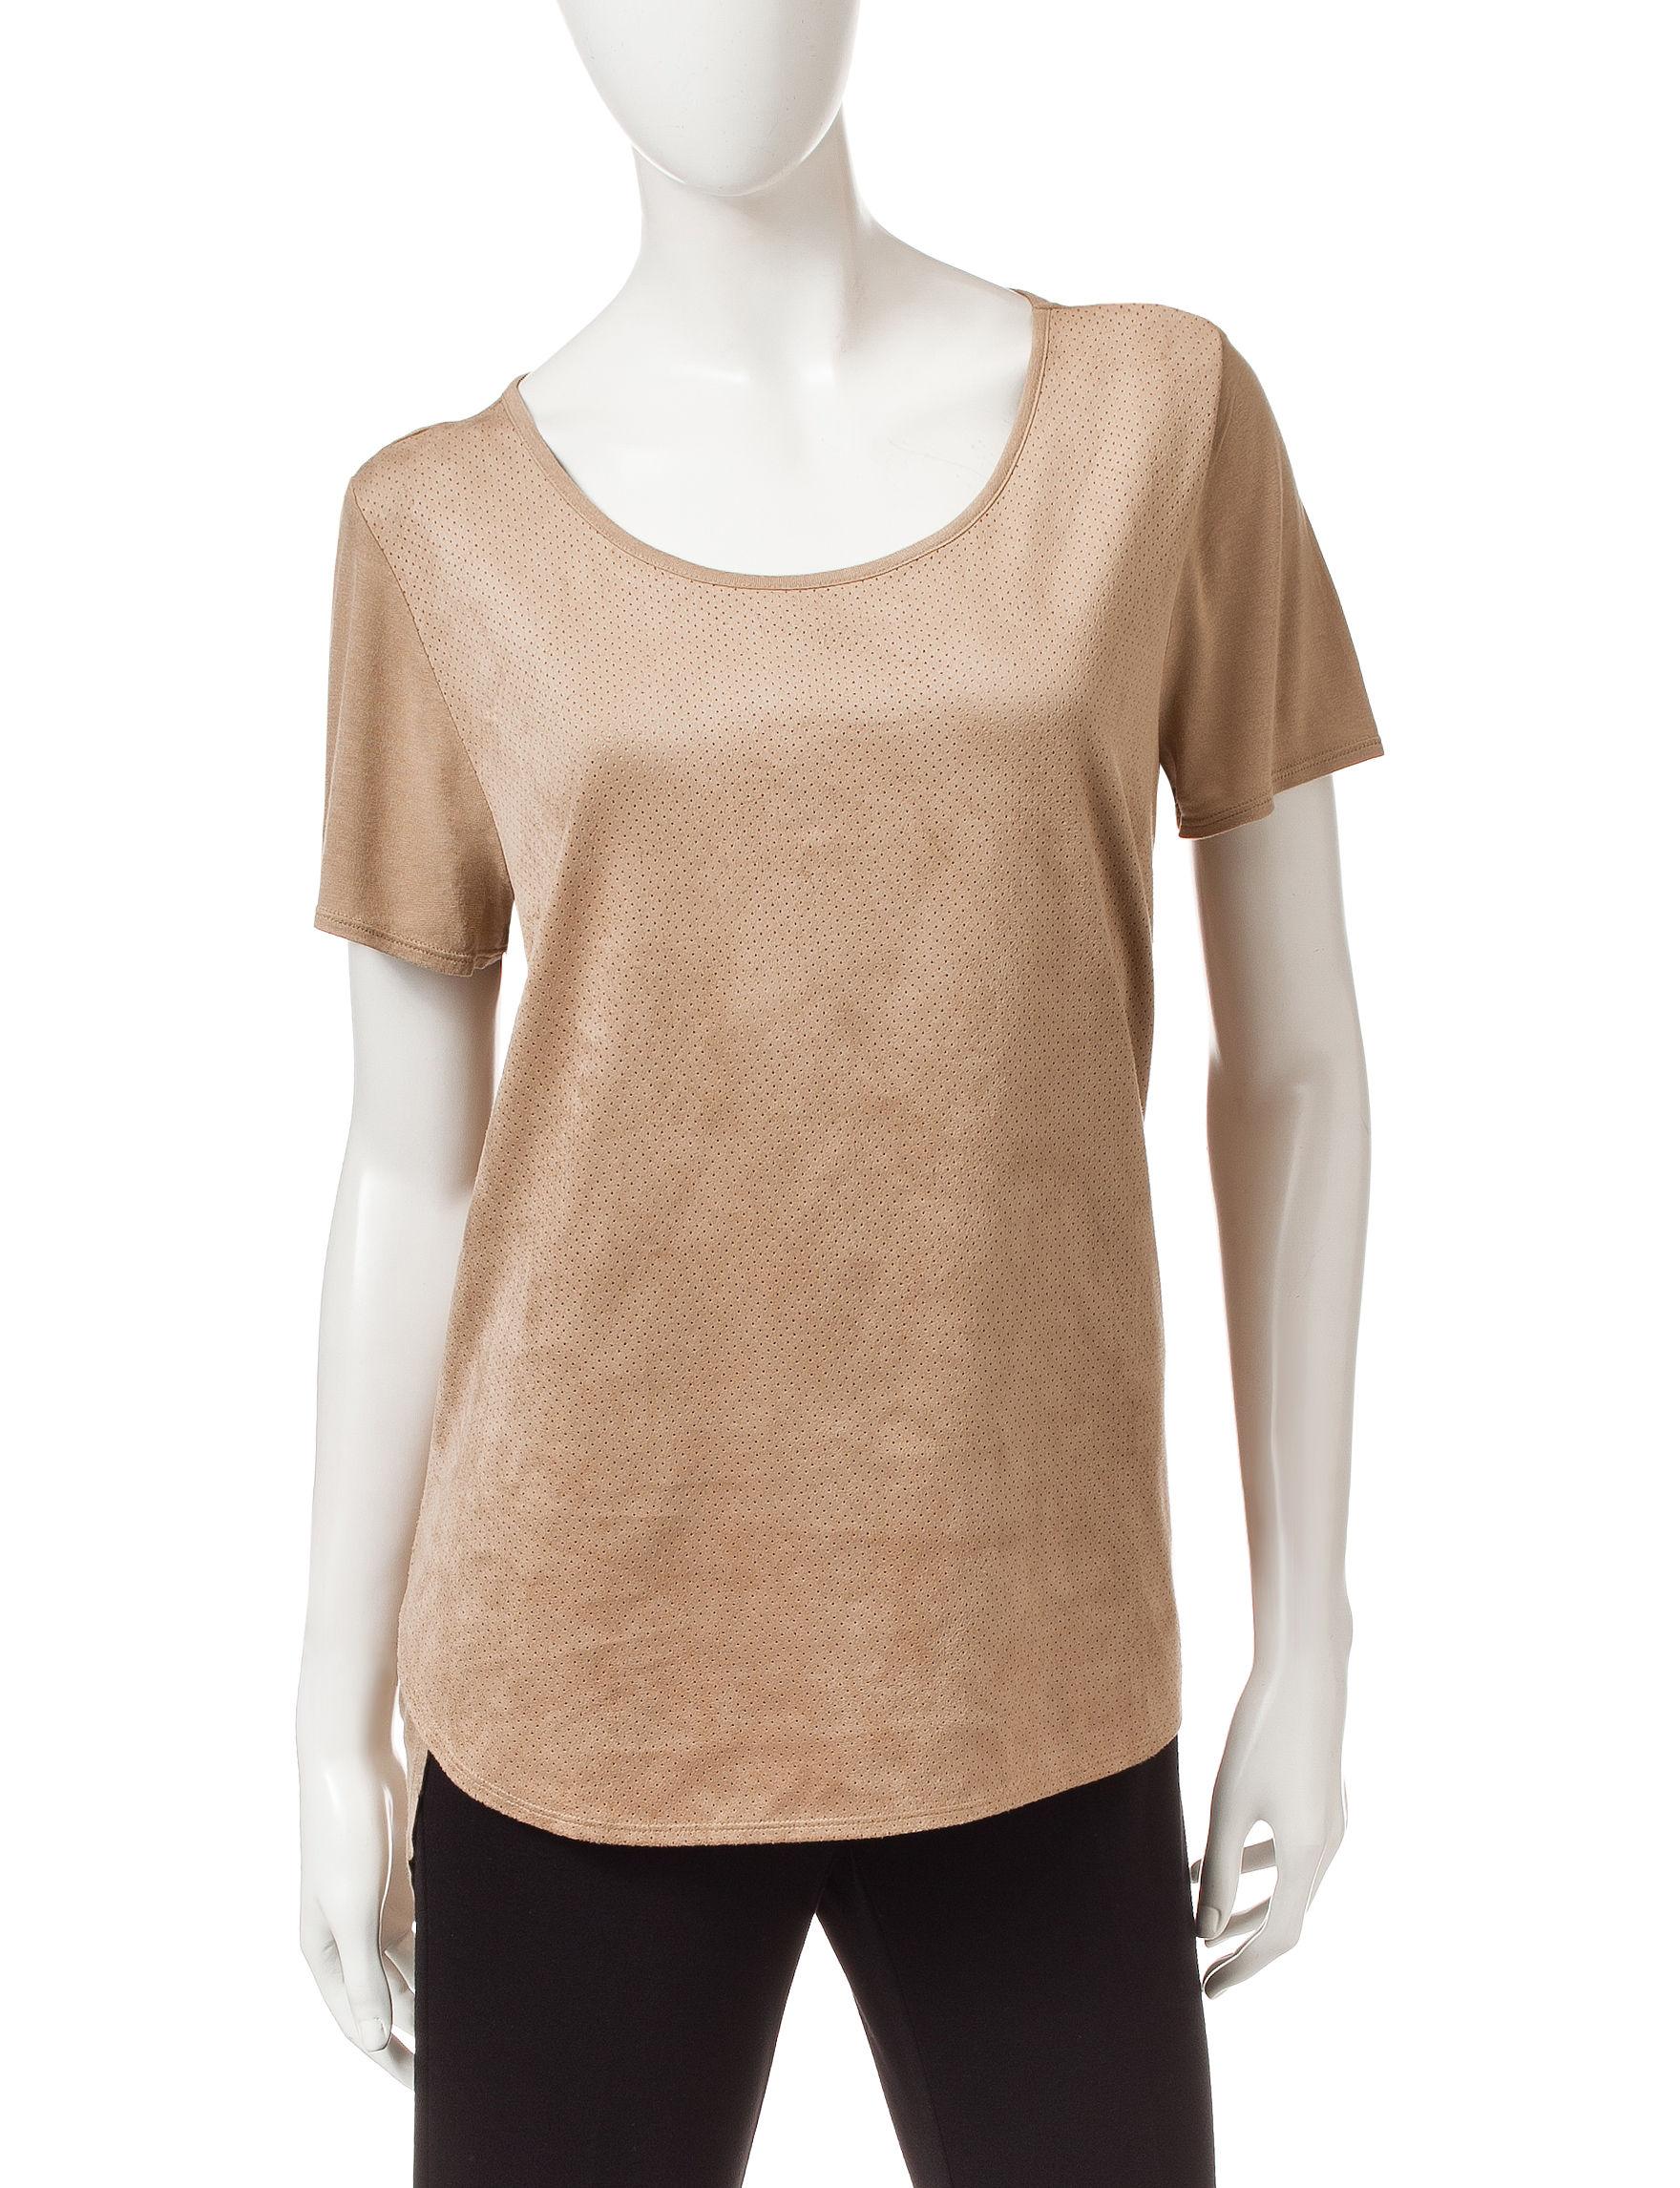 Bandolino Beige Pull-overs Shirts & Blouses